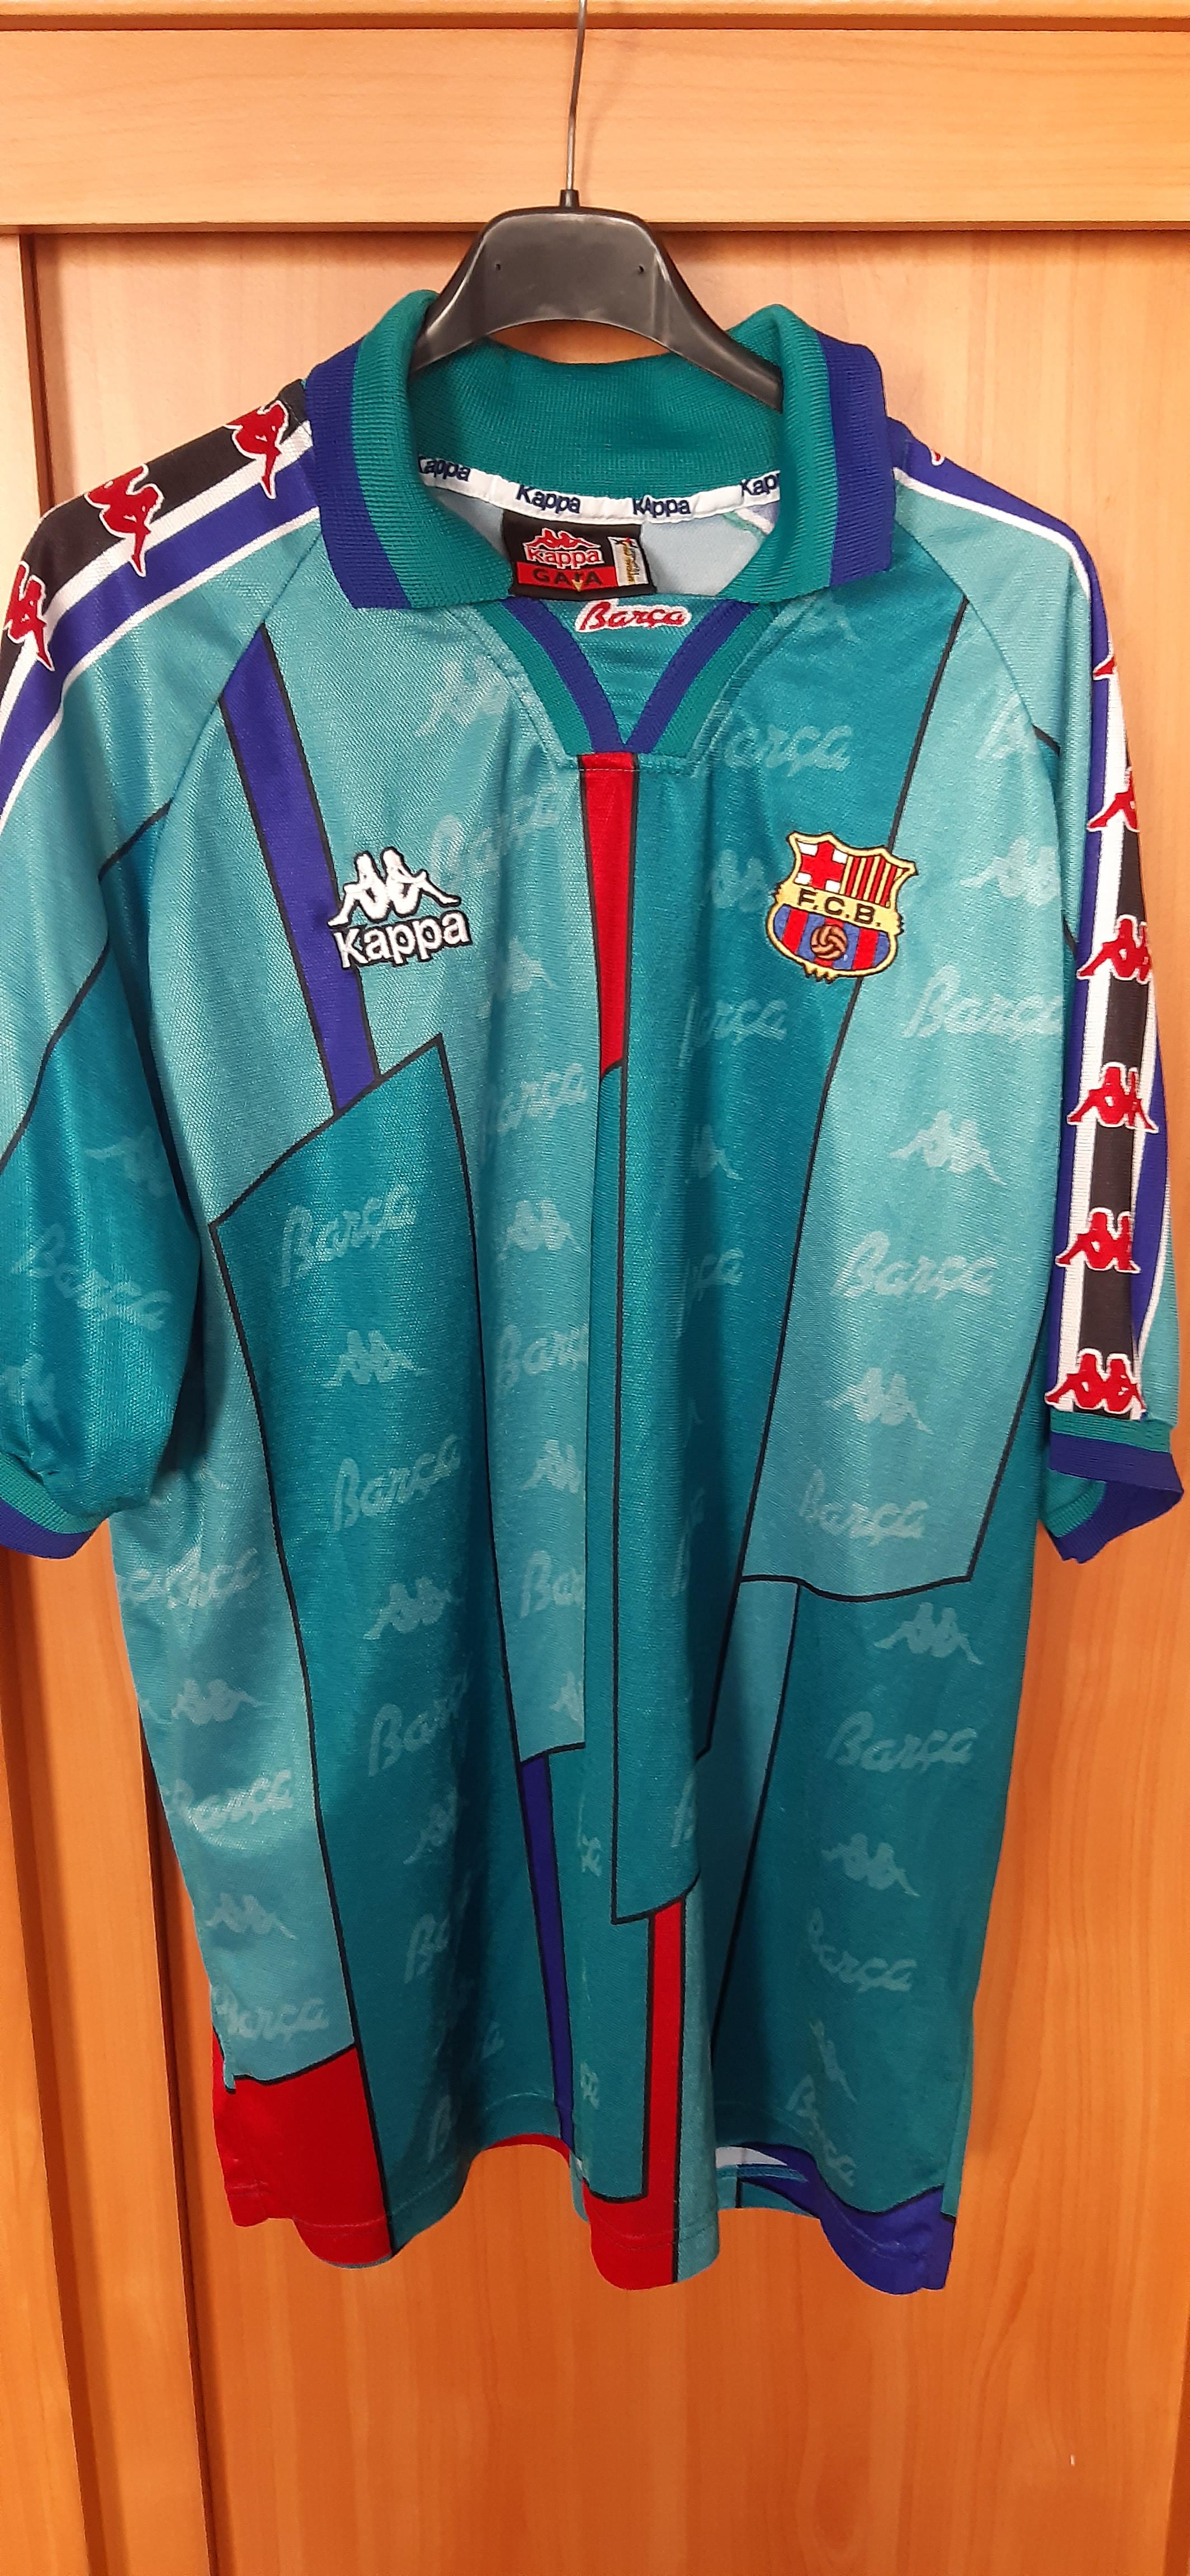 new styles 79ac0 ea4c1 1995-97 Barcelona Kappa Away Football Soccer Jersey XL